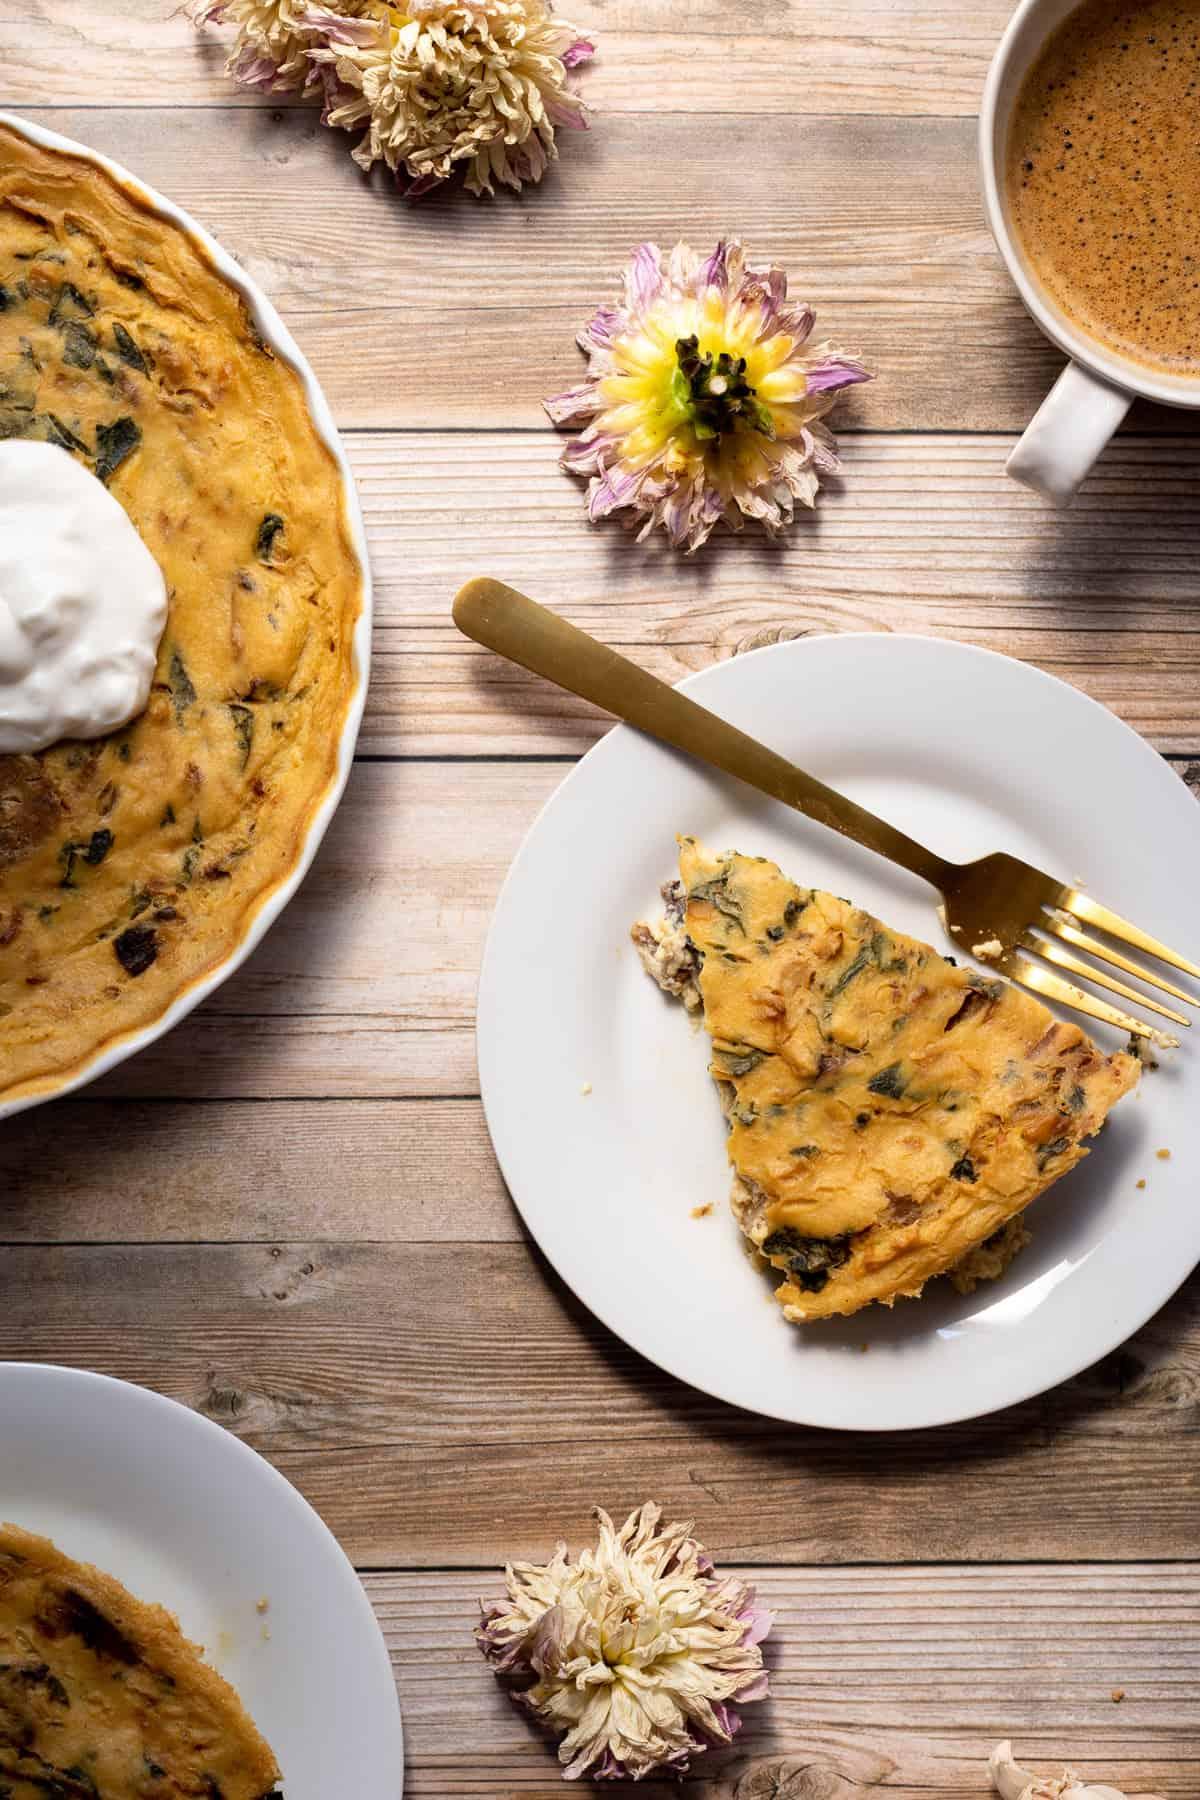 slices of vegan crustless quiche on white plates